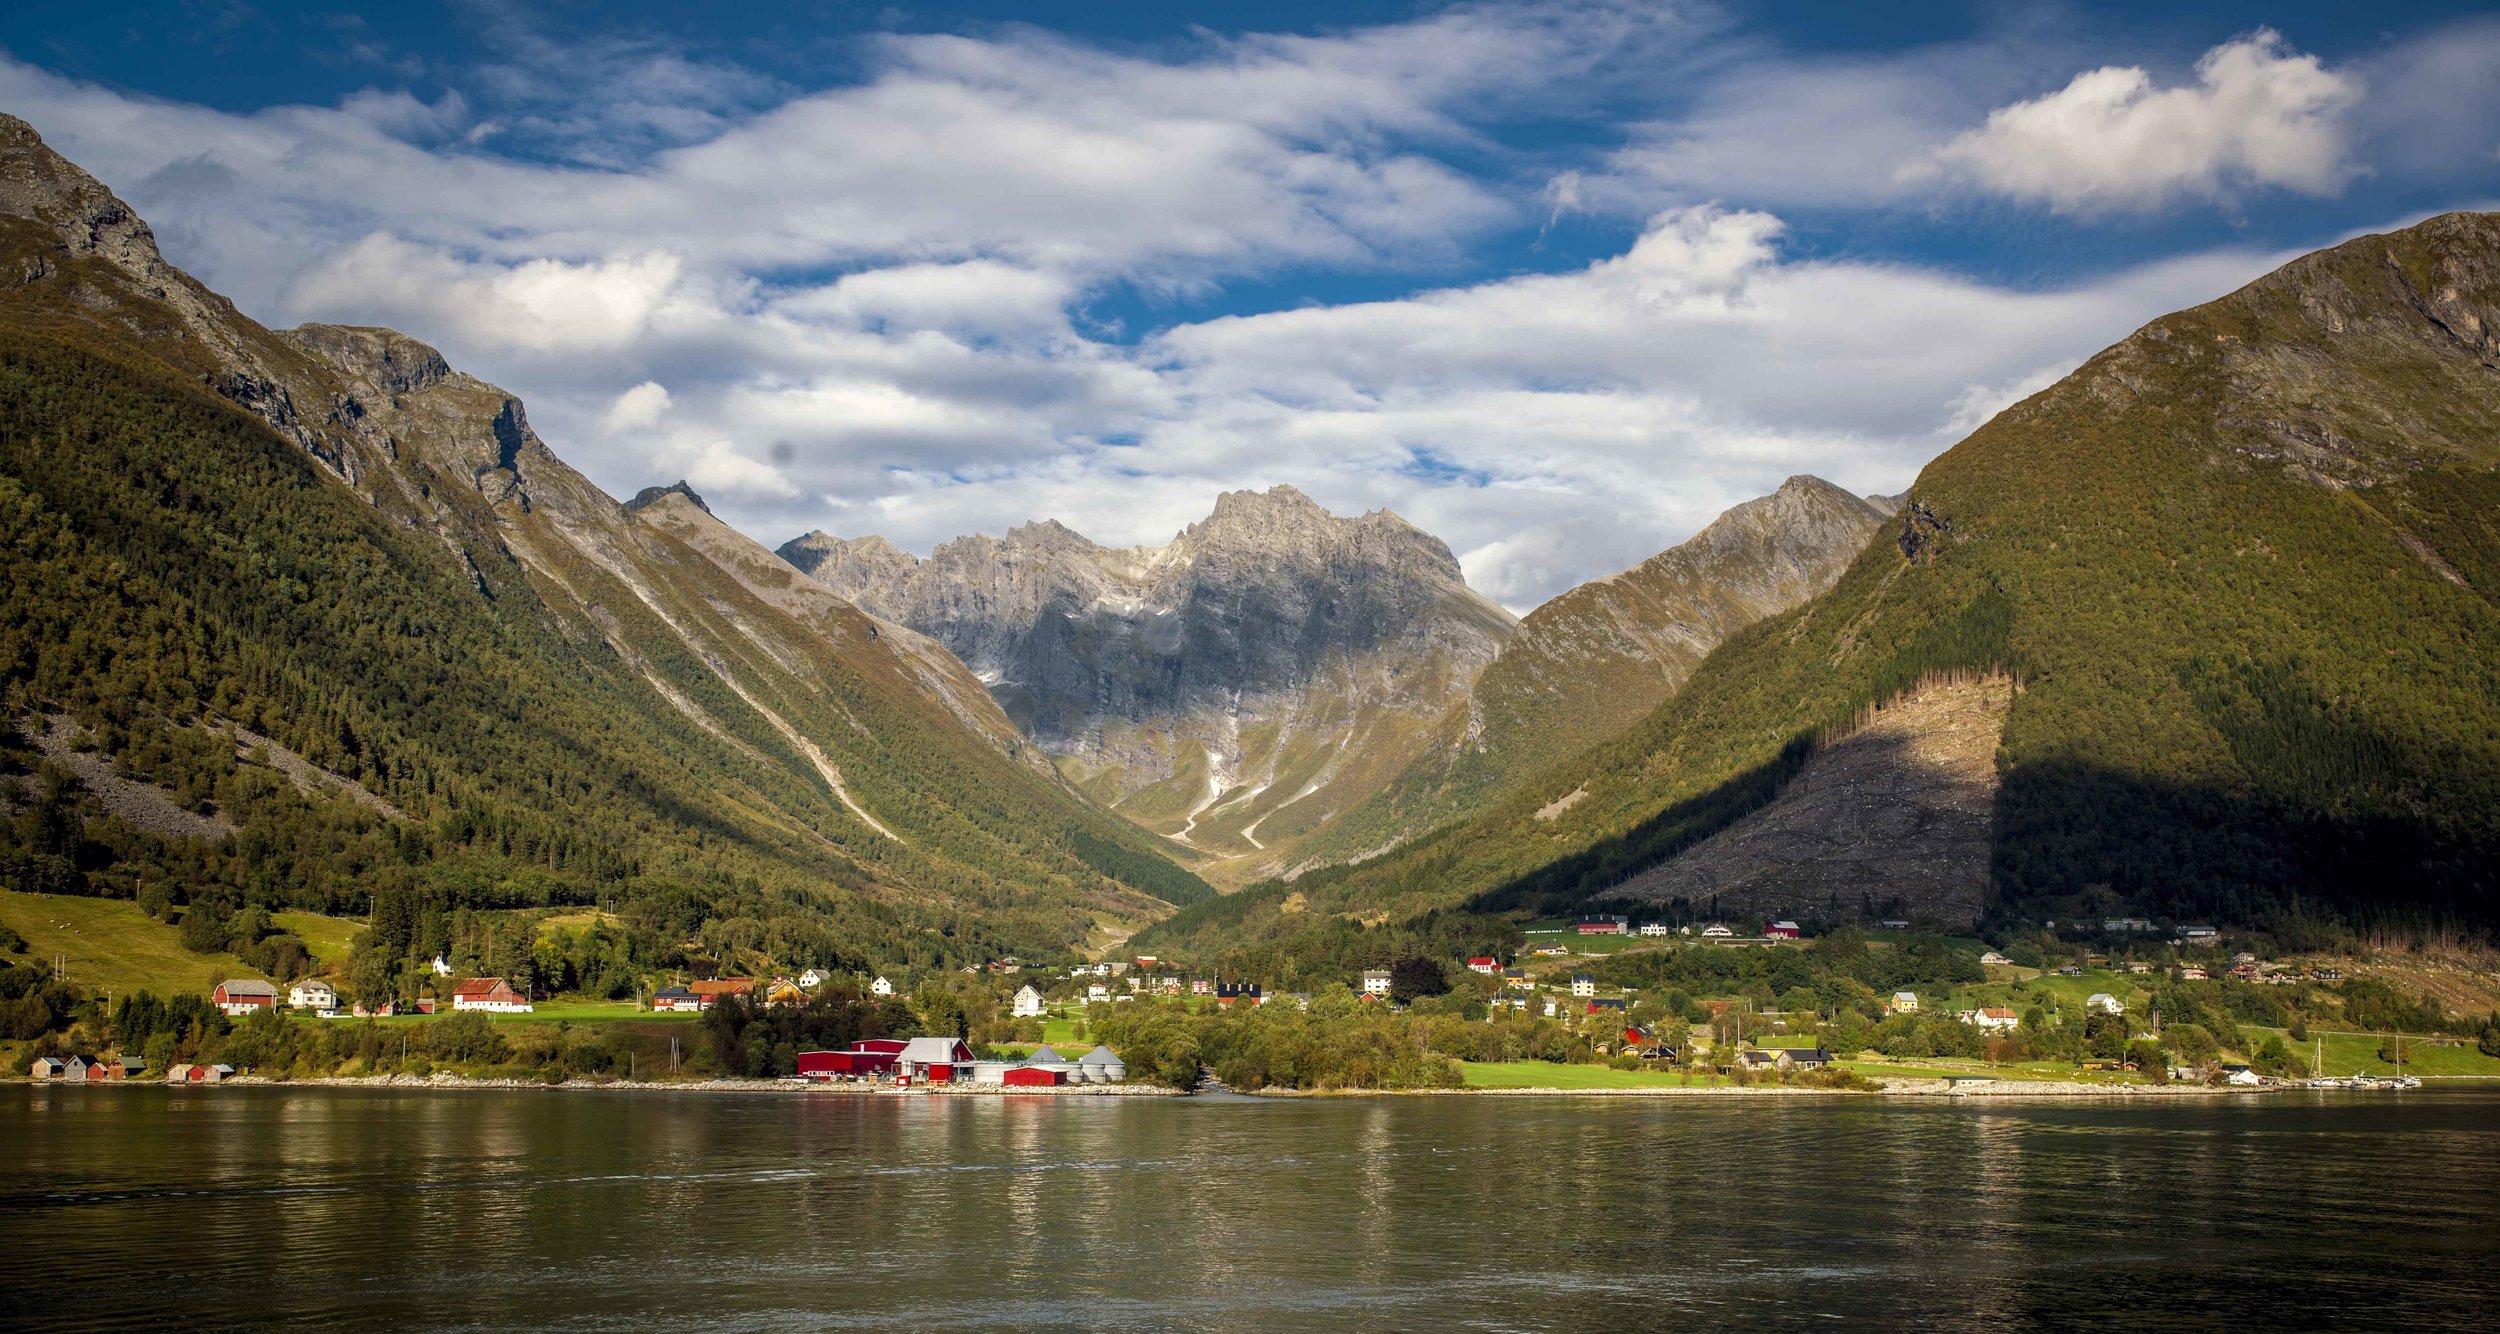 Hjørunnfjord, Norway